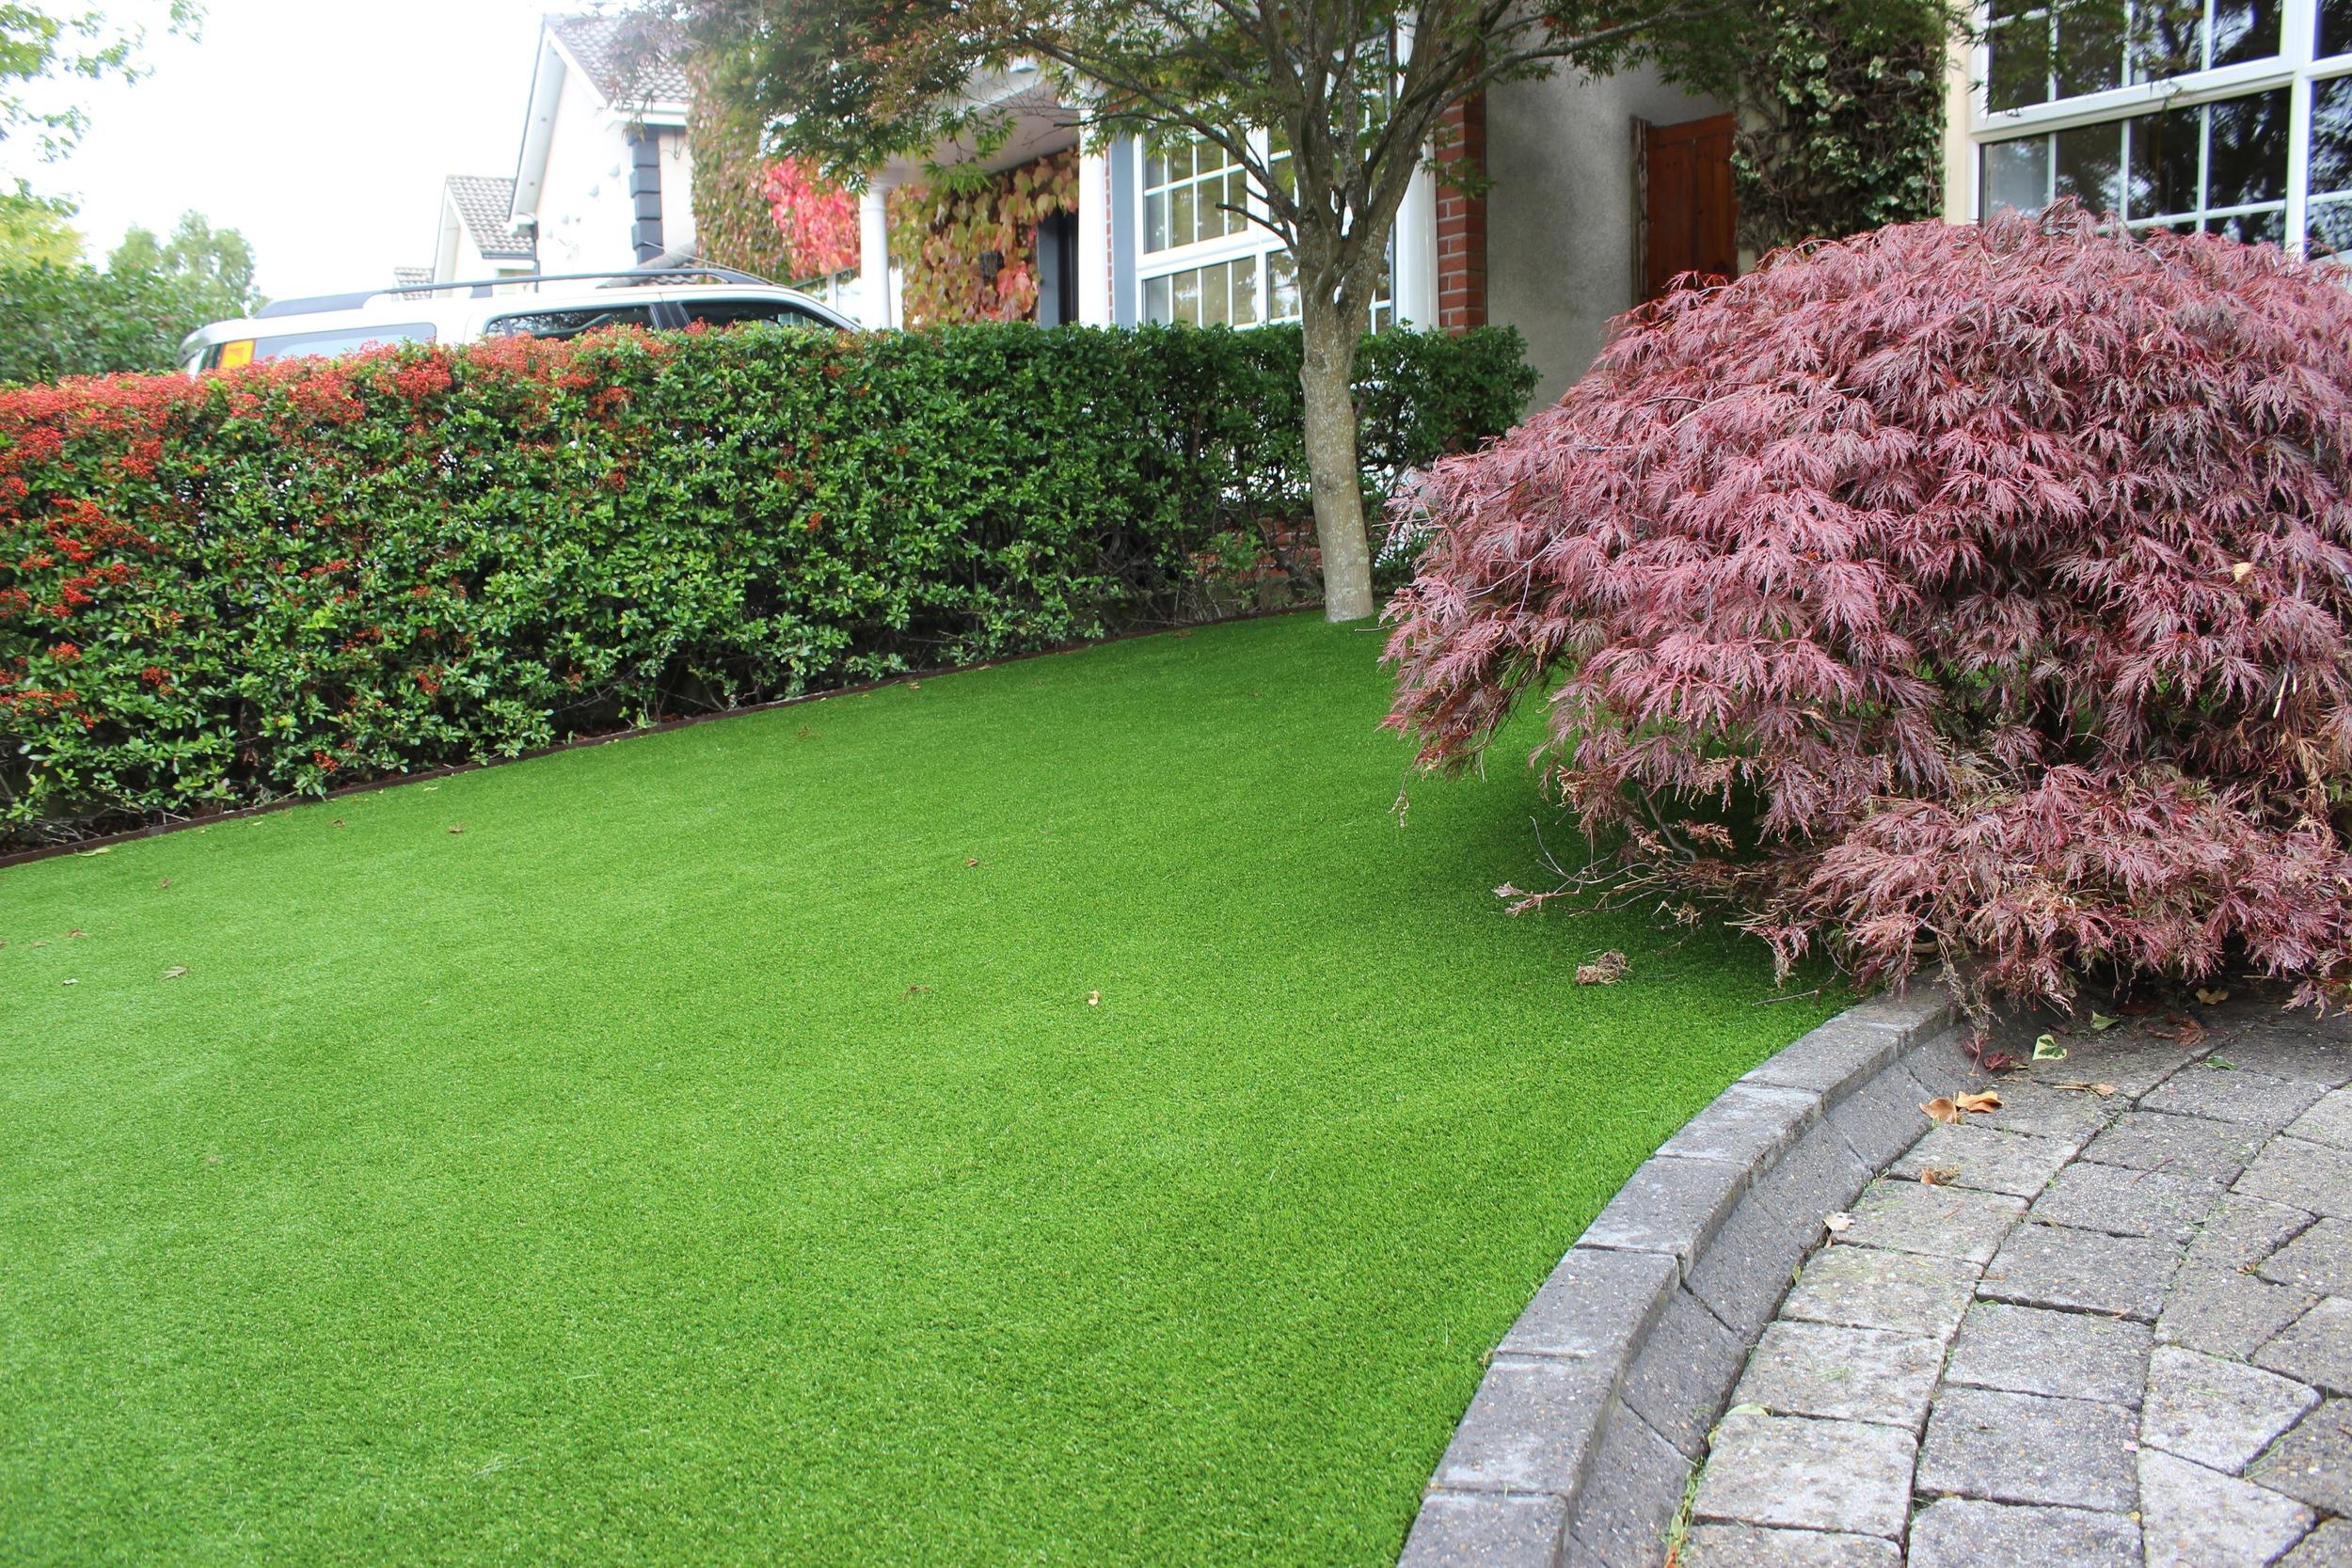 grass lawn front garden.jpg